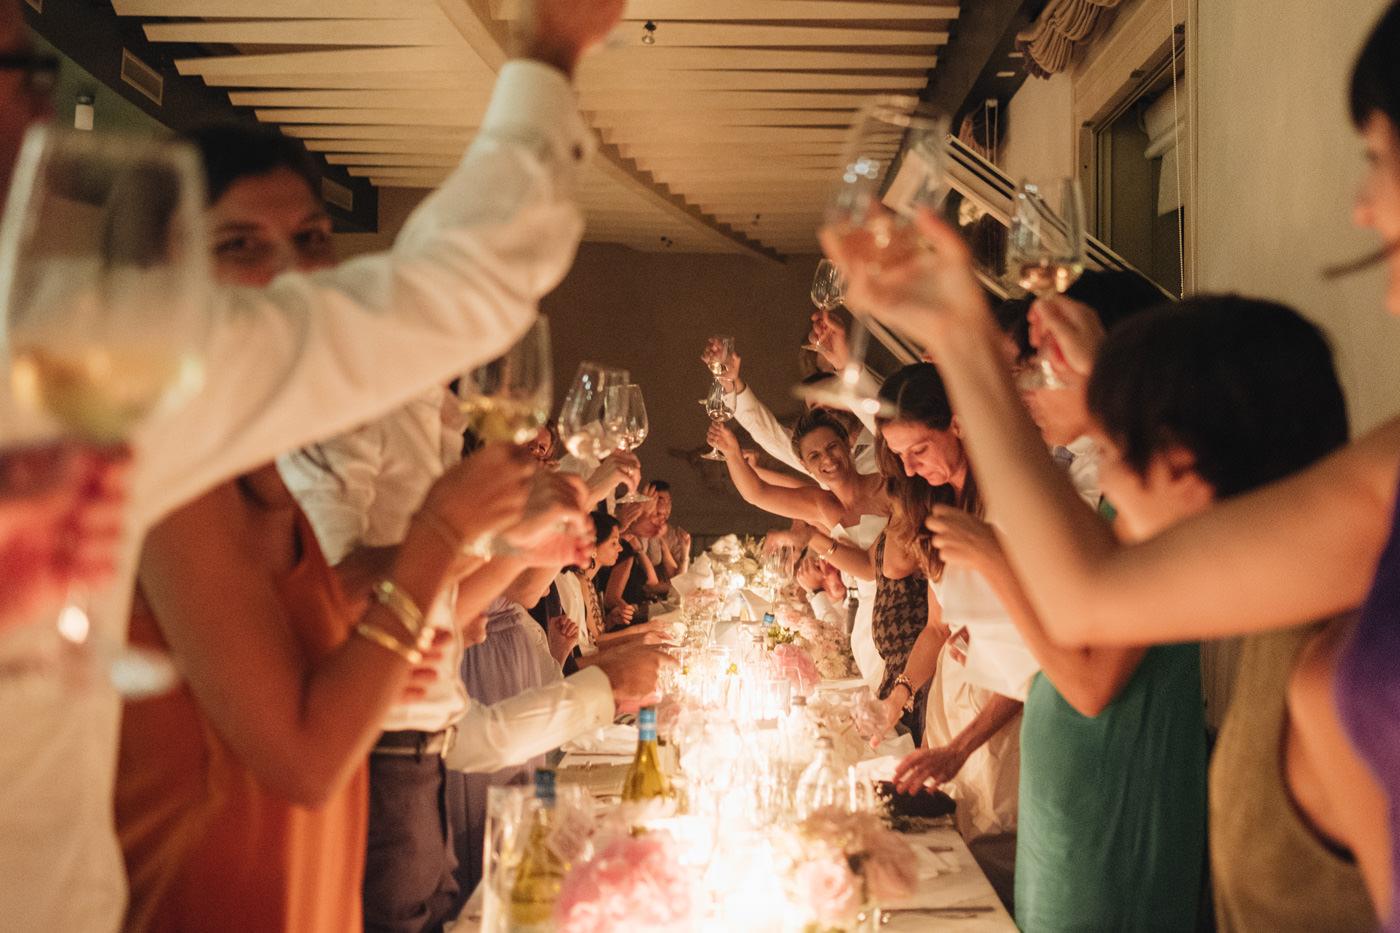 matrimoni_all_italiana_fotografo_matrimonio_cinque_terre-68.jpg